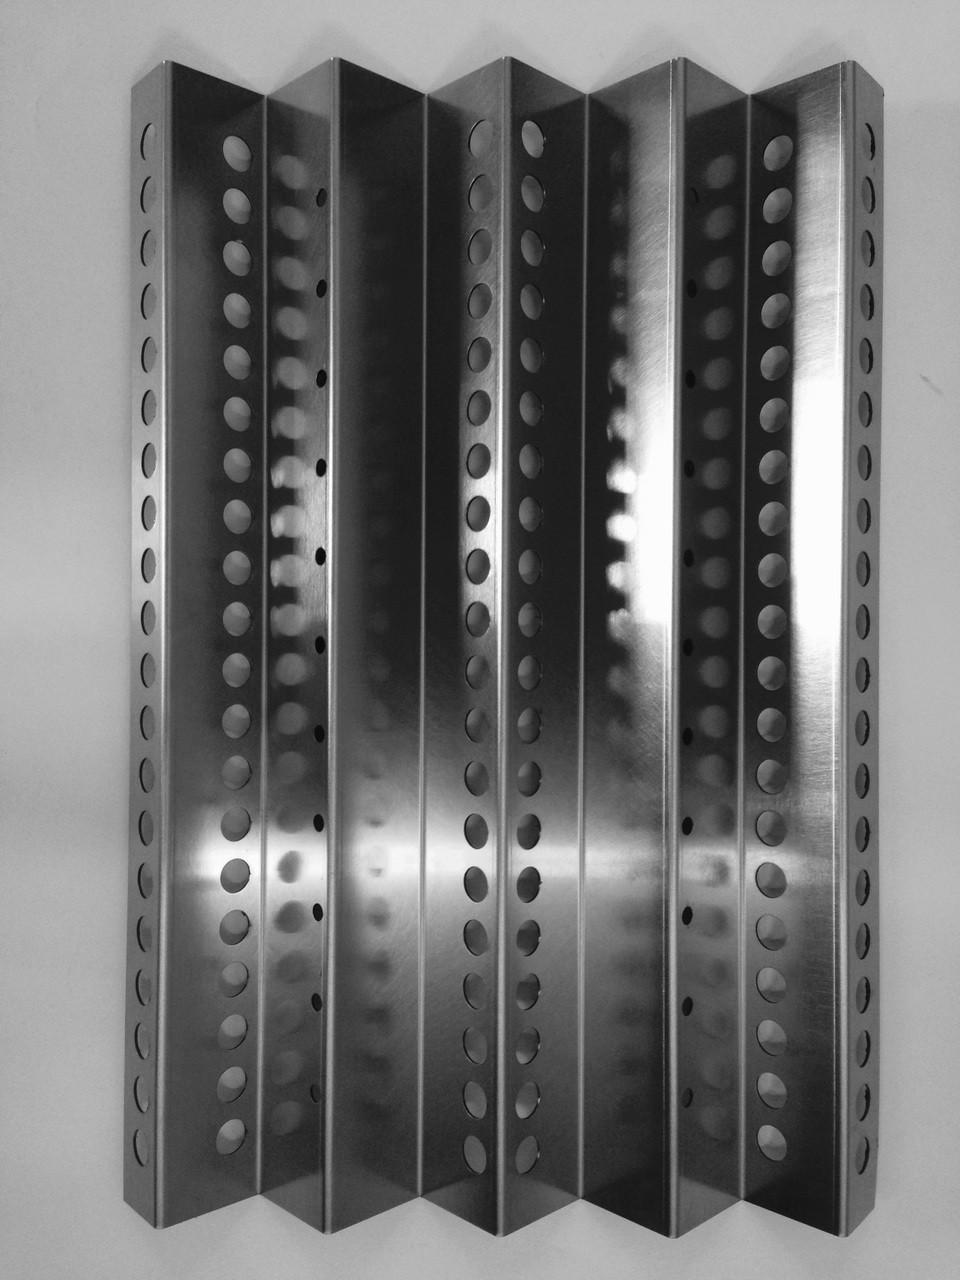 DCSHP3 18 5//8 x 9 7//8 Frontgate Ceramic rod radiant tray DCS